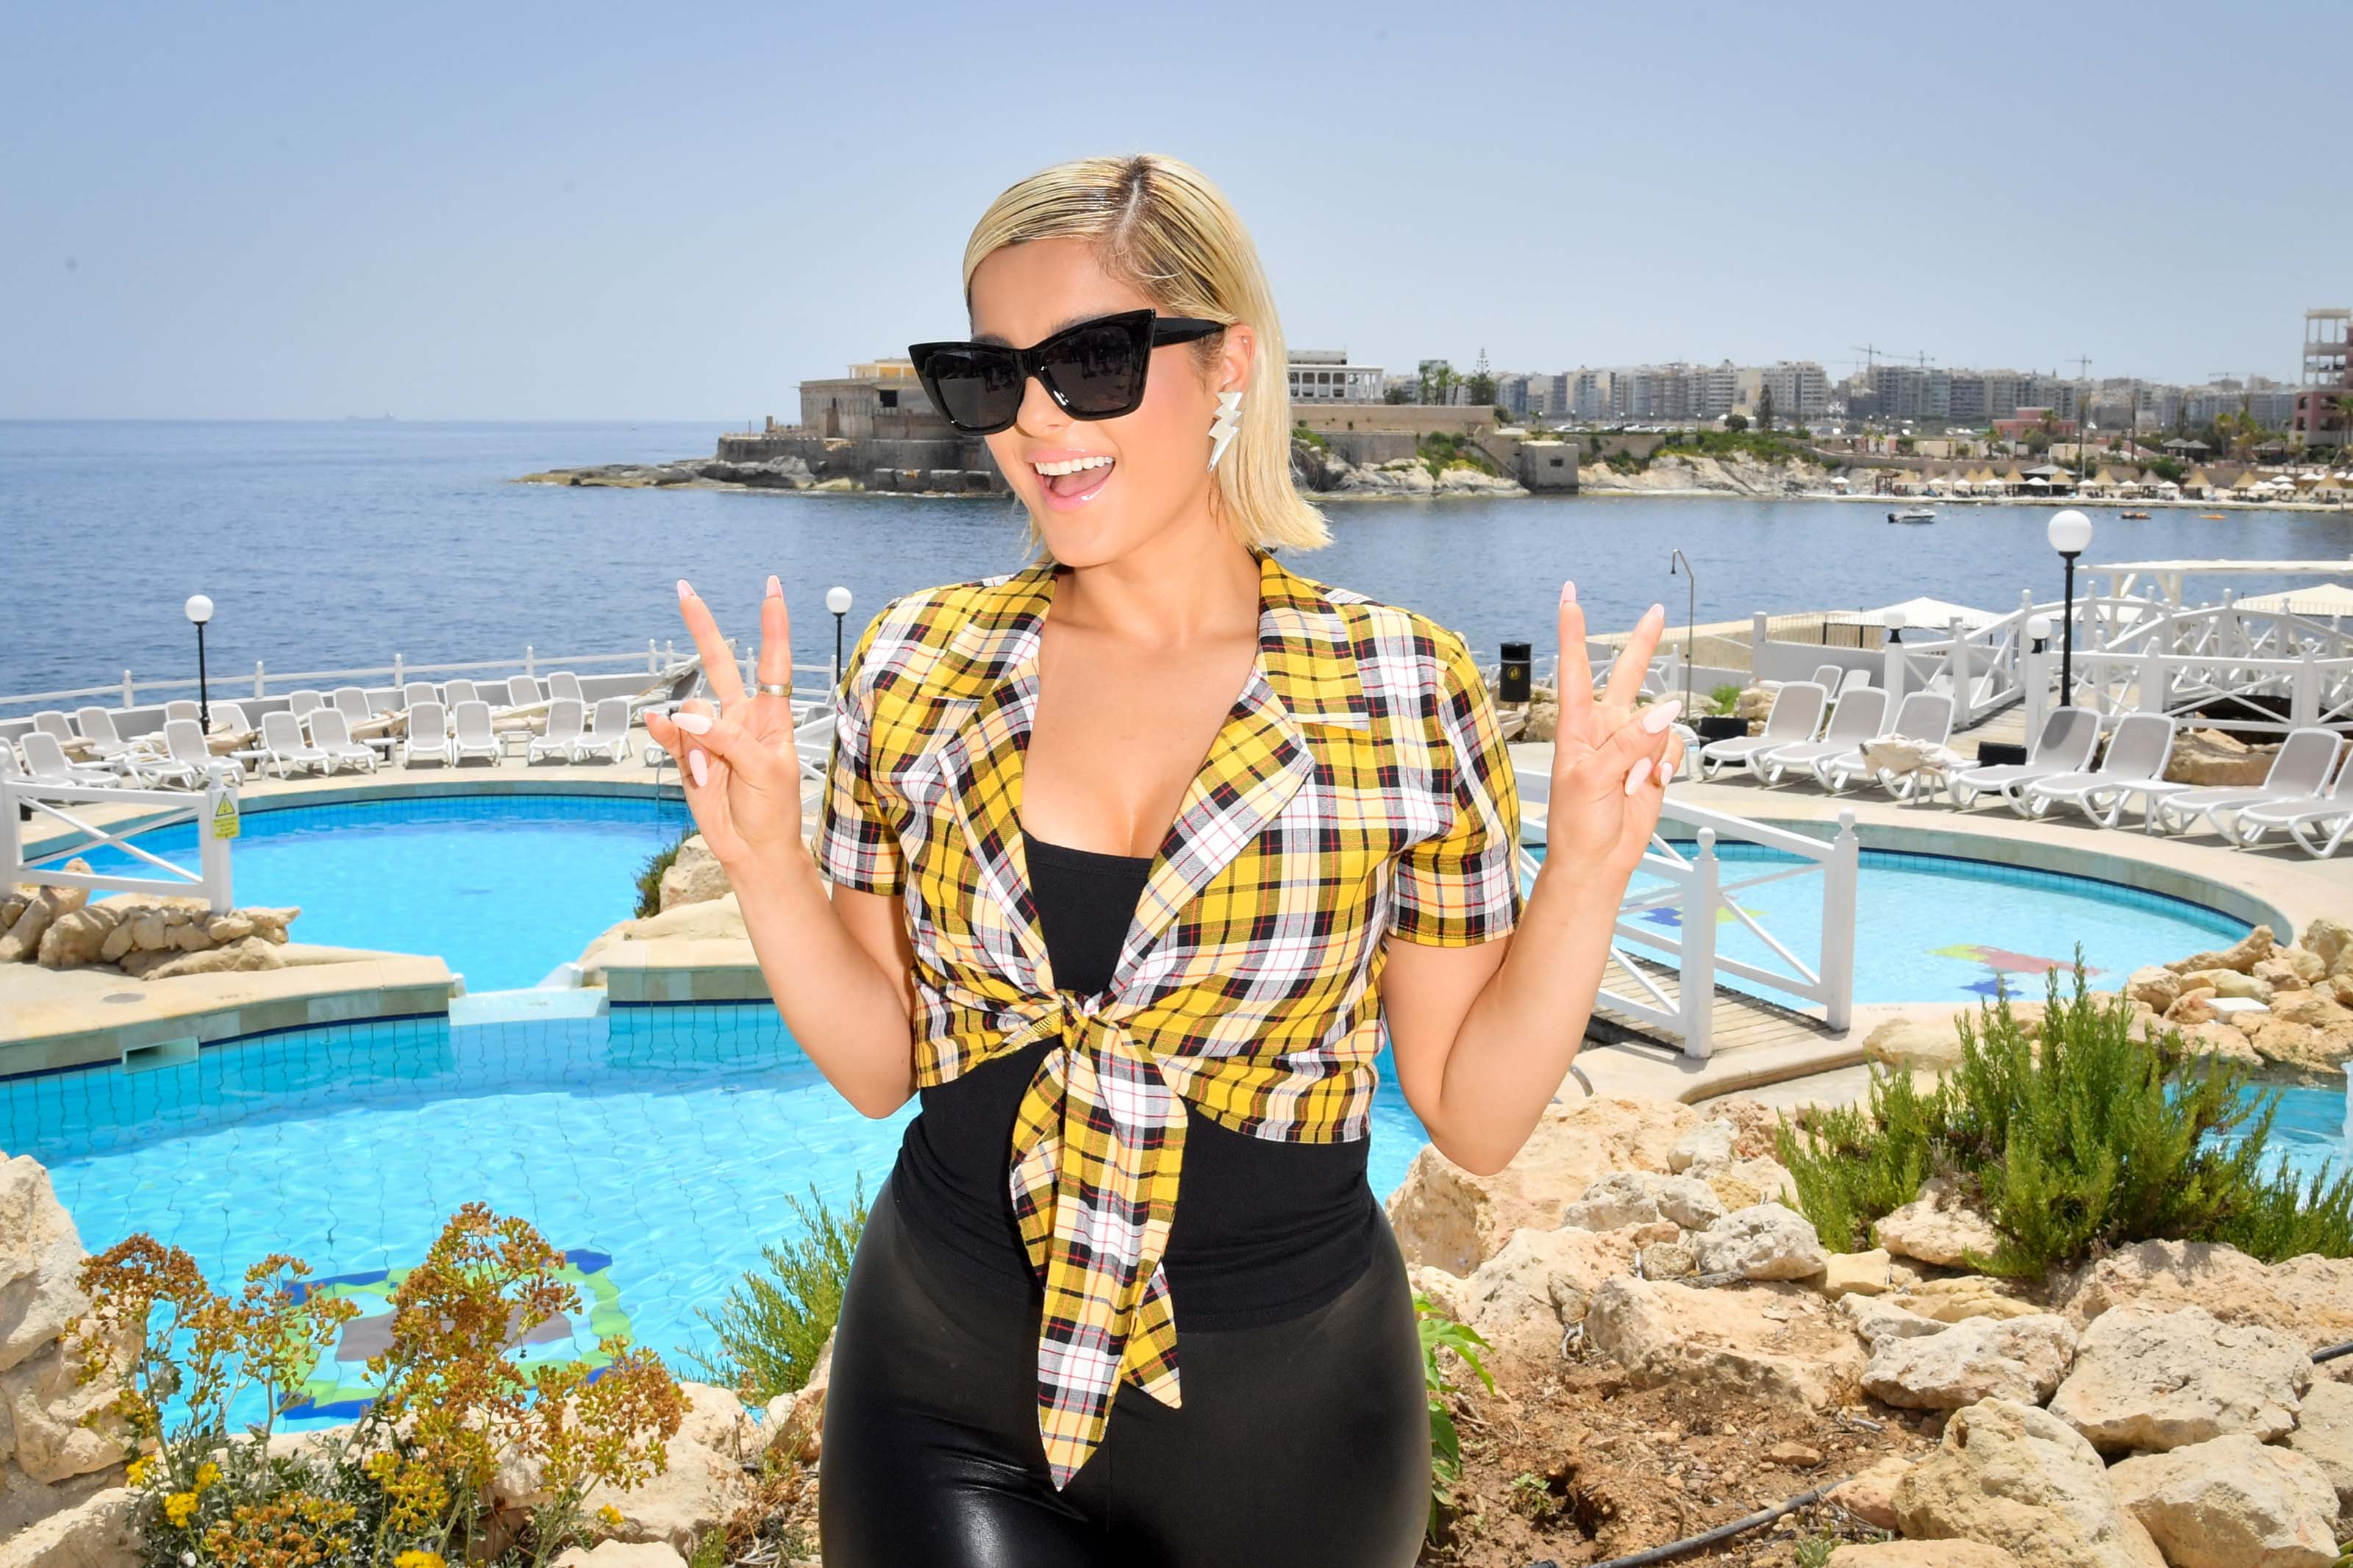 Bebe Rexha attends Isle of MTV Photo Call